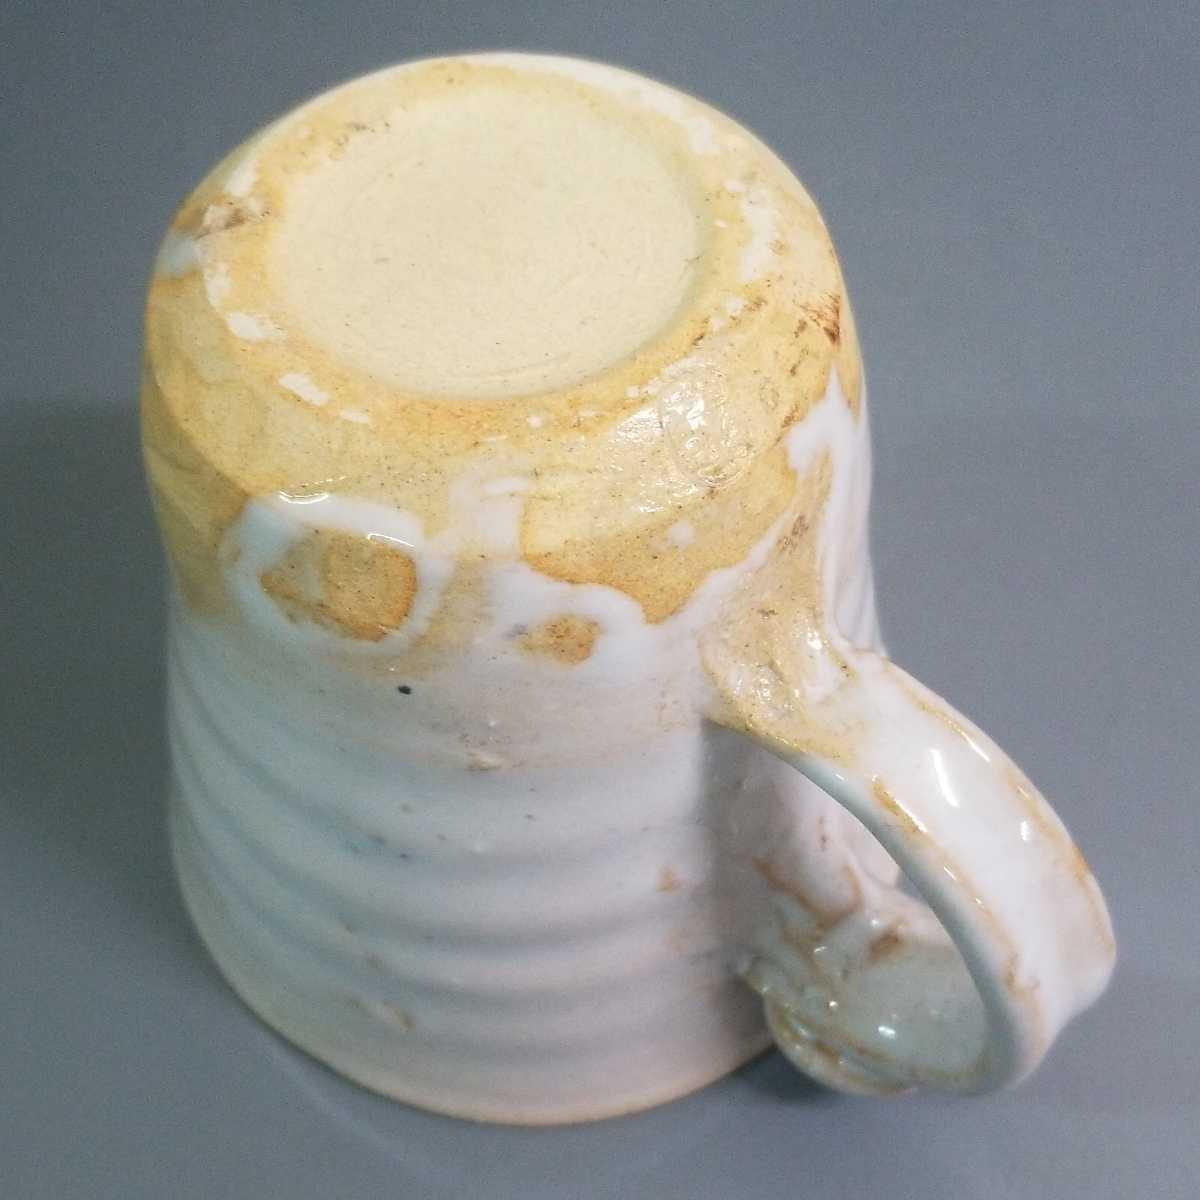 賜67)萩焼 渋谷泥詩 白萩マグカップ 珈琲器 茶器 未使用新品 同梱歓迎 _画像6